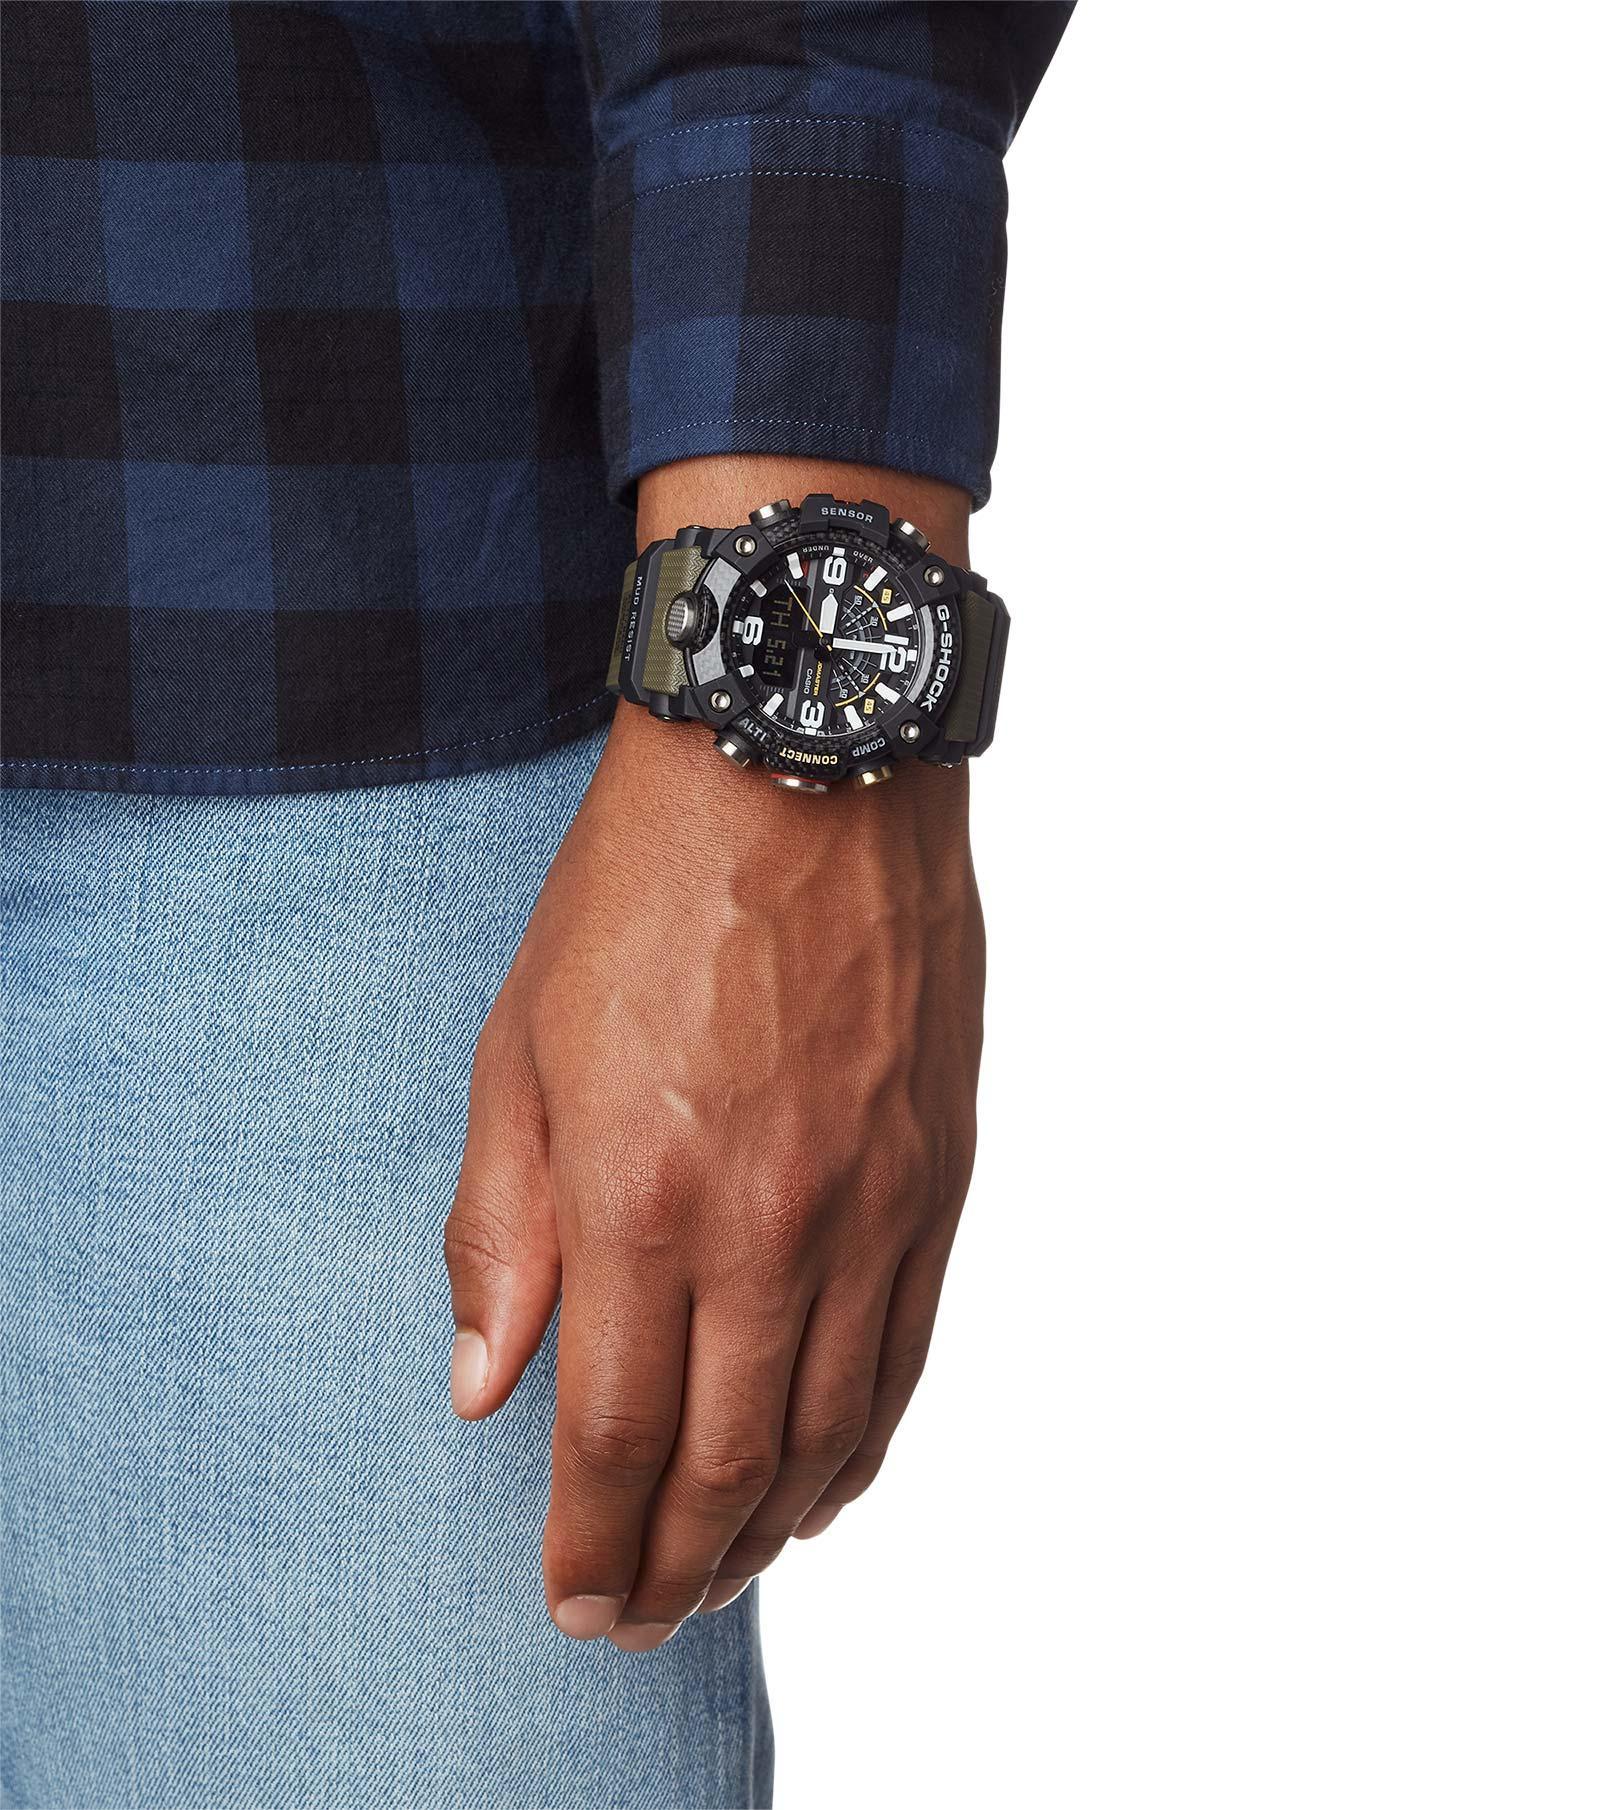 Zegarek męski Casio g-shock master of g GG-B100-1A3ER - duże 4